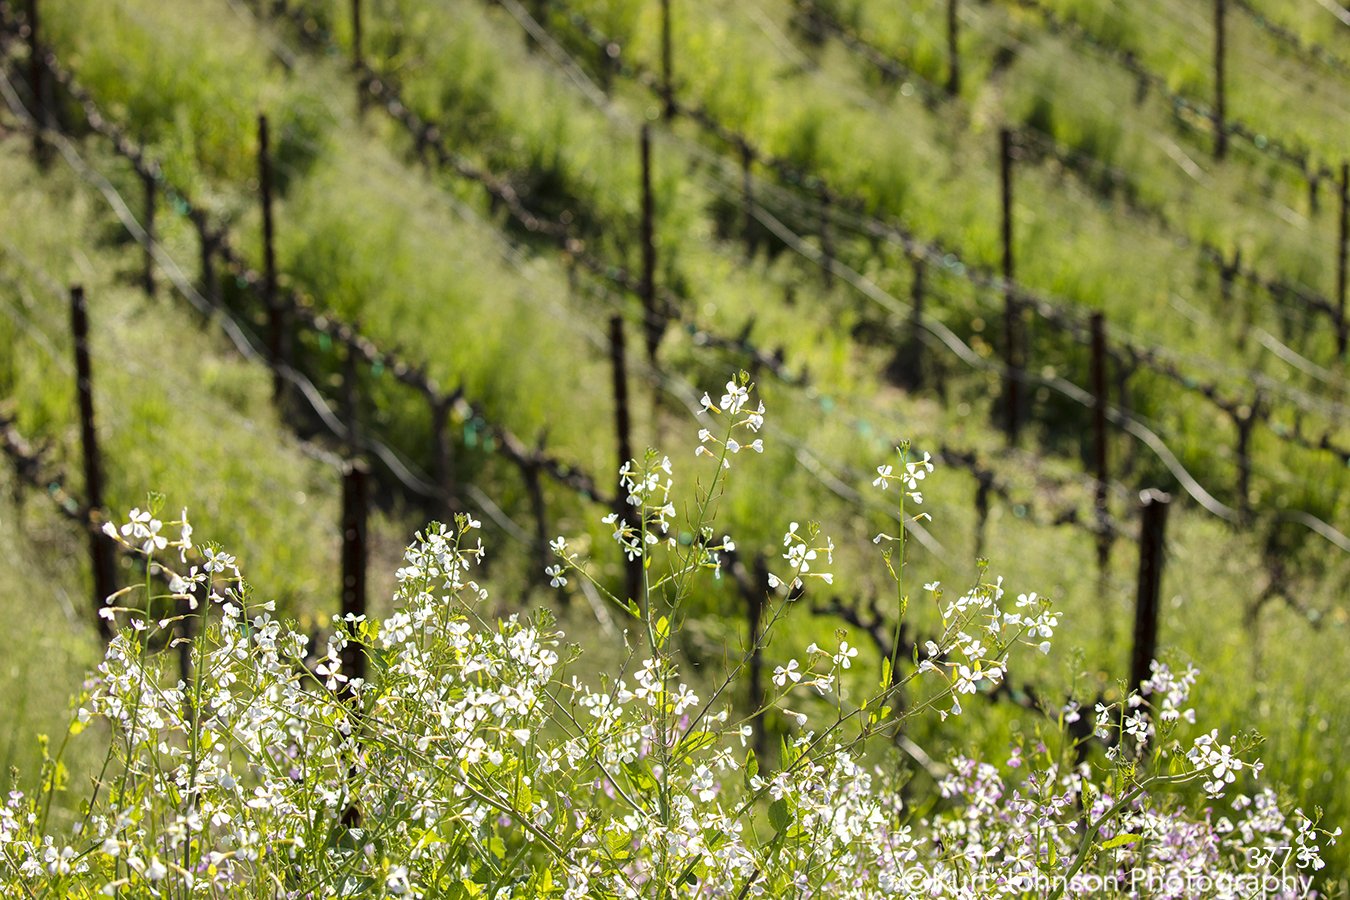 green grass grasses lines vineyard pattern